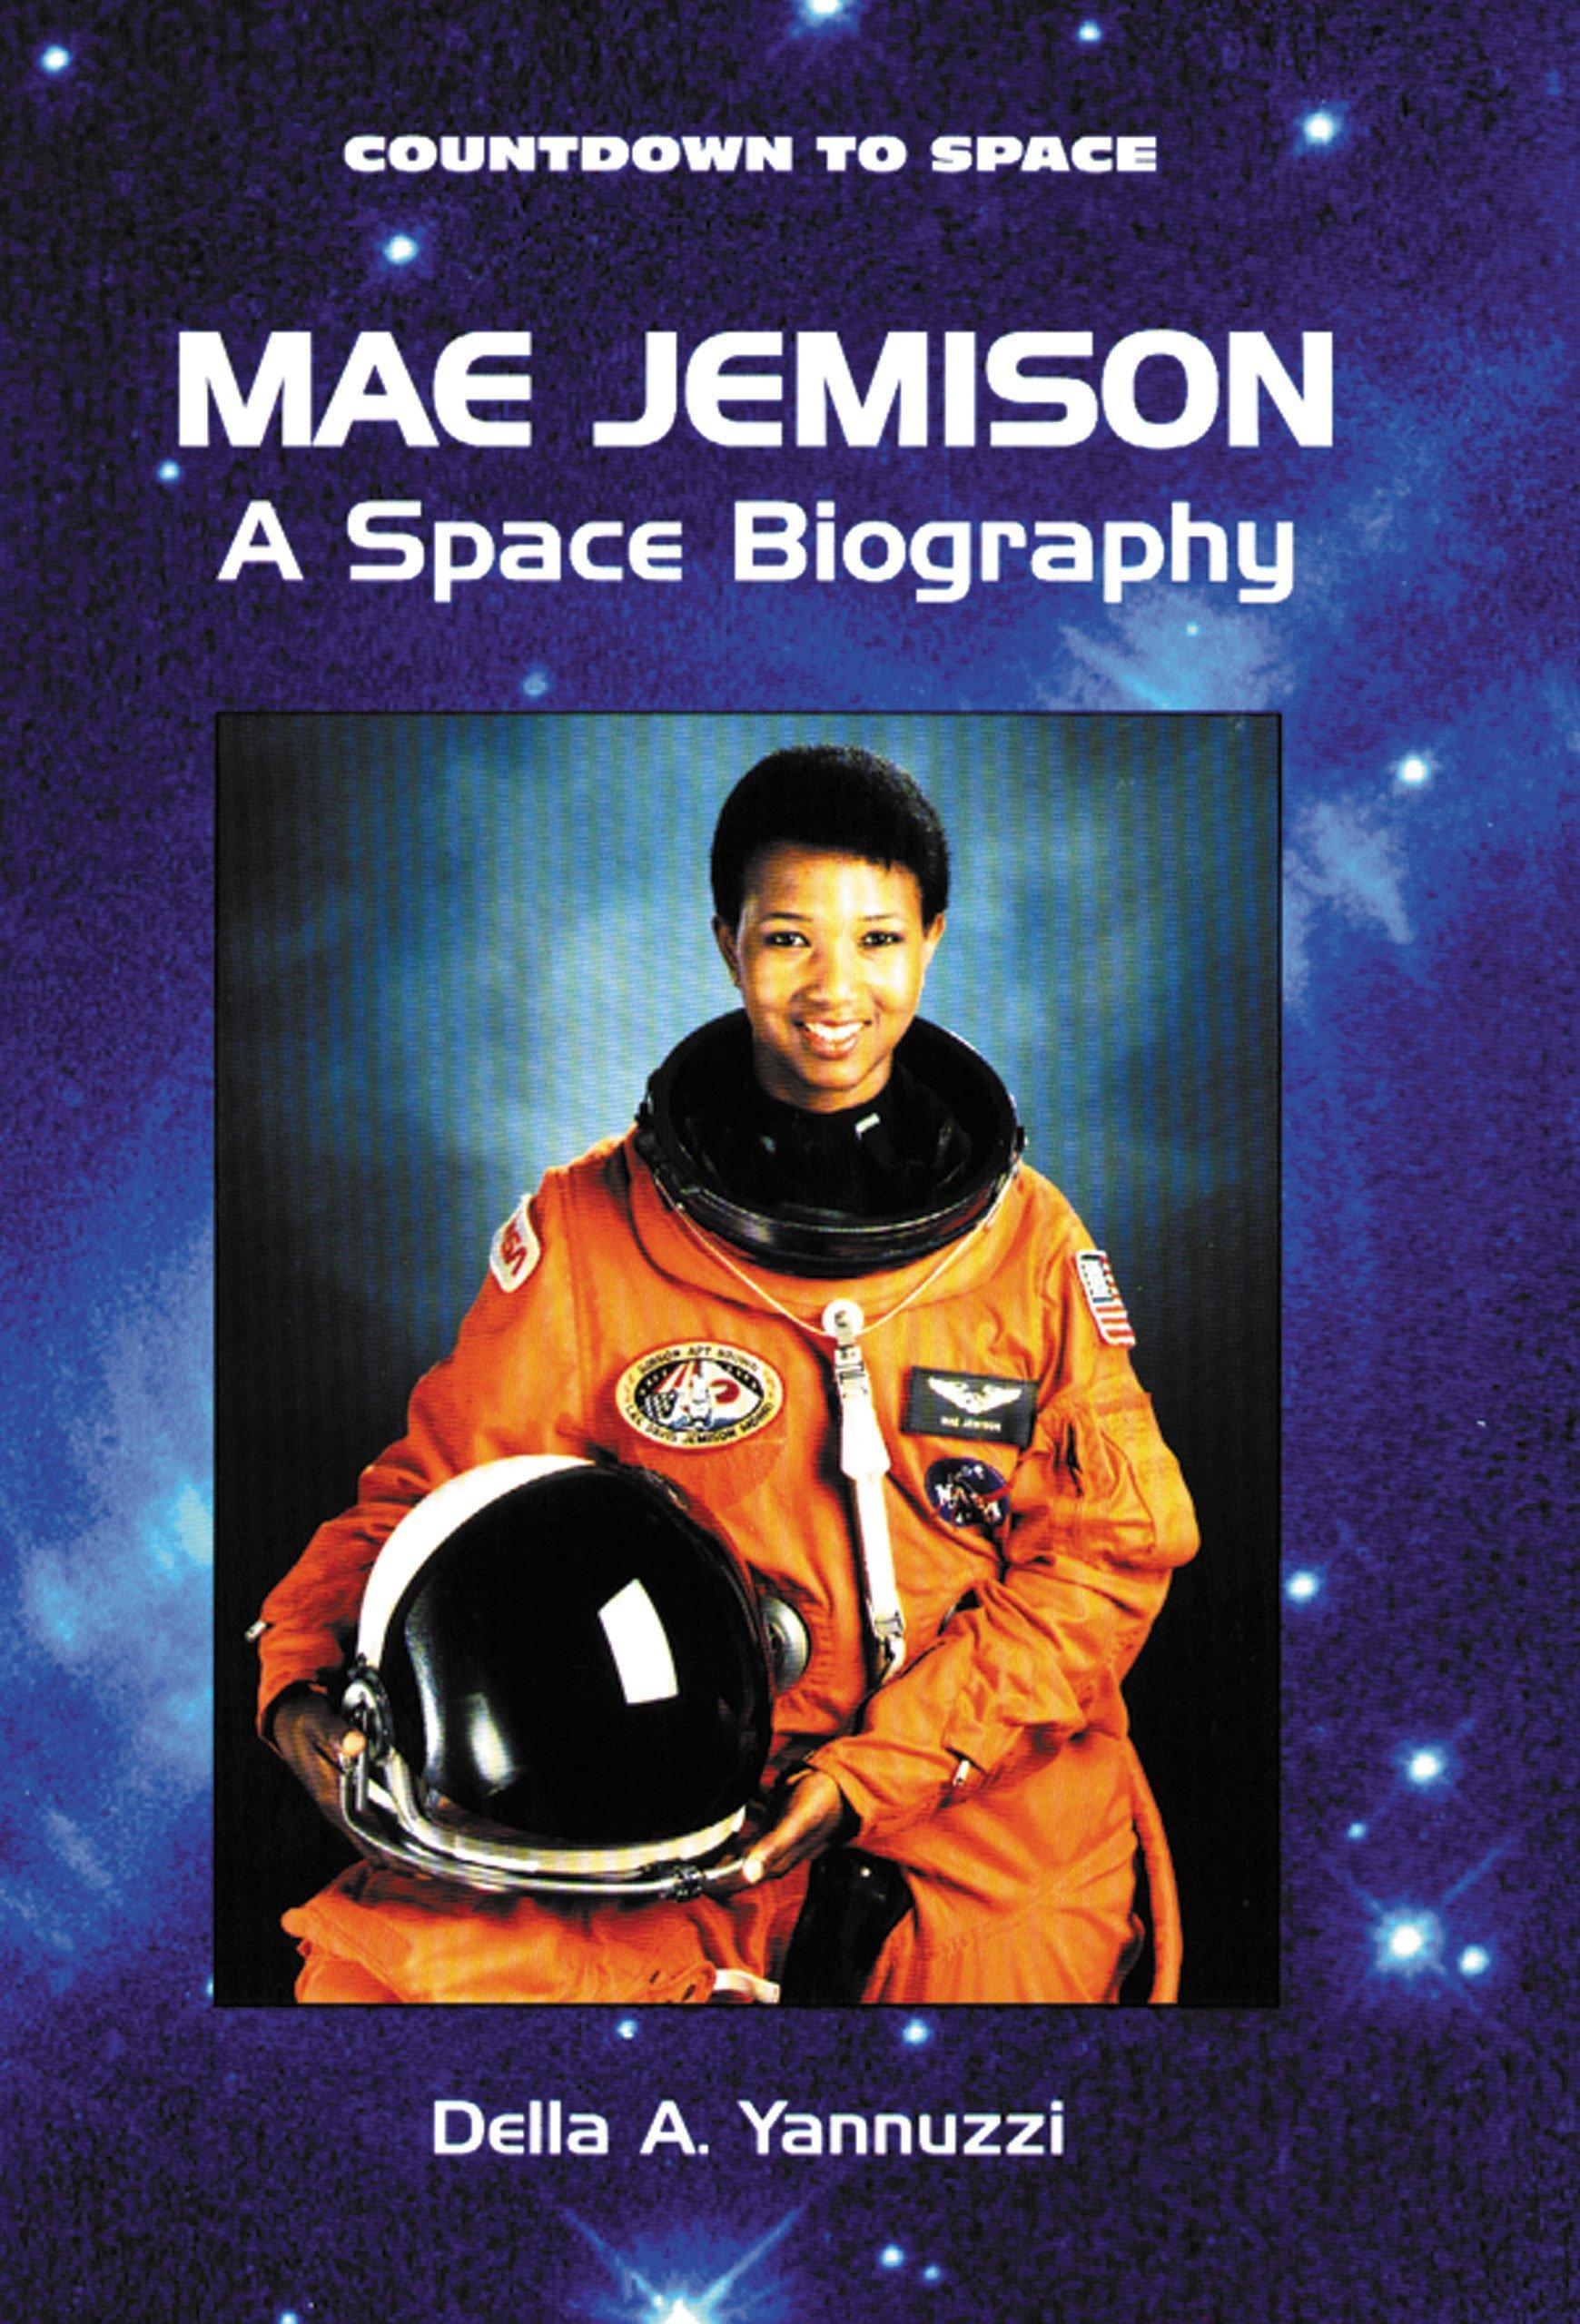 Mae Jemison: A Space Biography (Countdown to Space): Della A ...